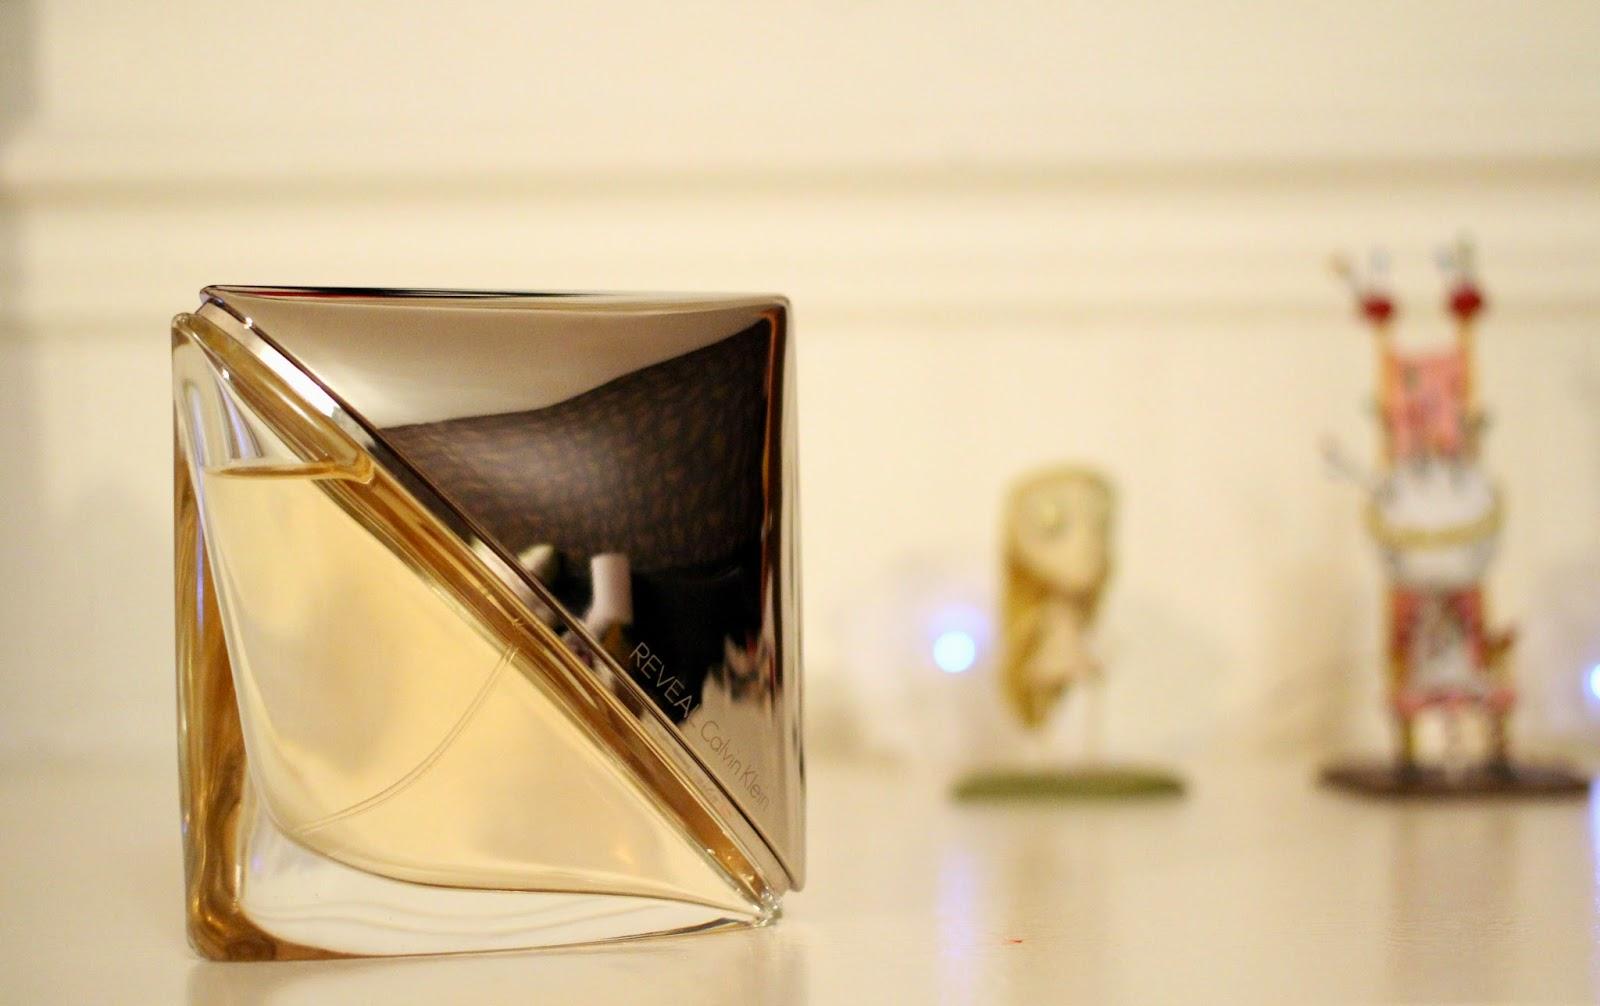 Calvin Klein Reveal perfume, Reveal Perfume, CK new perfume